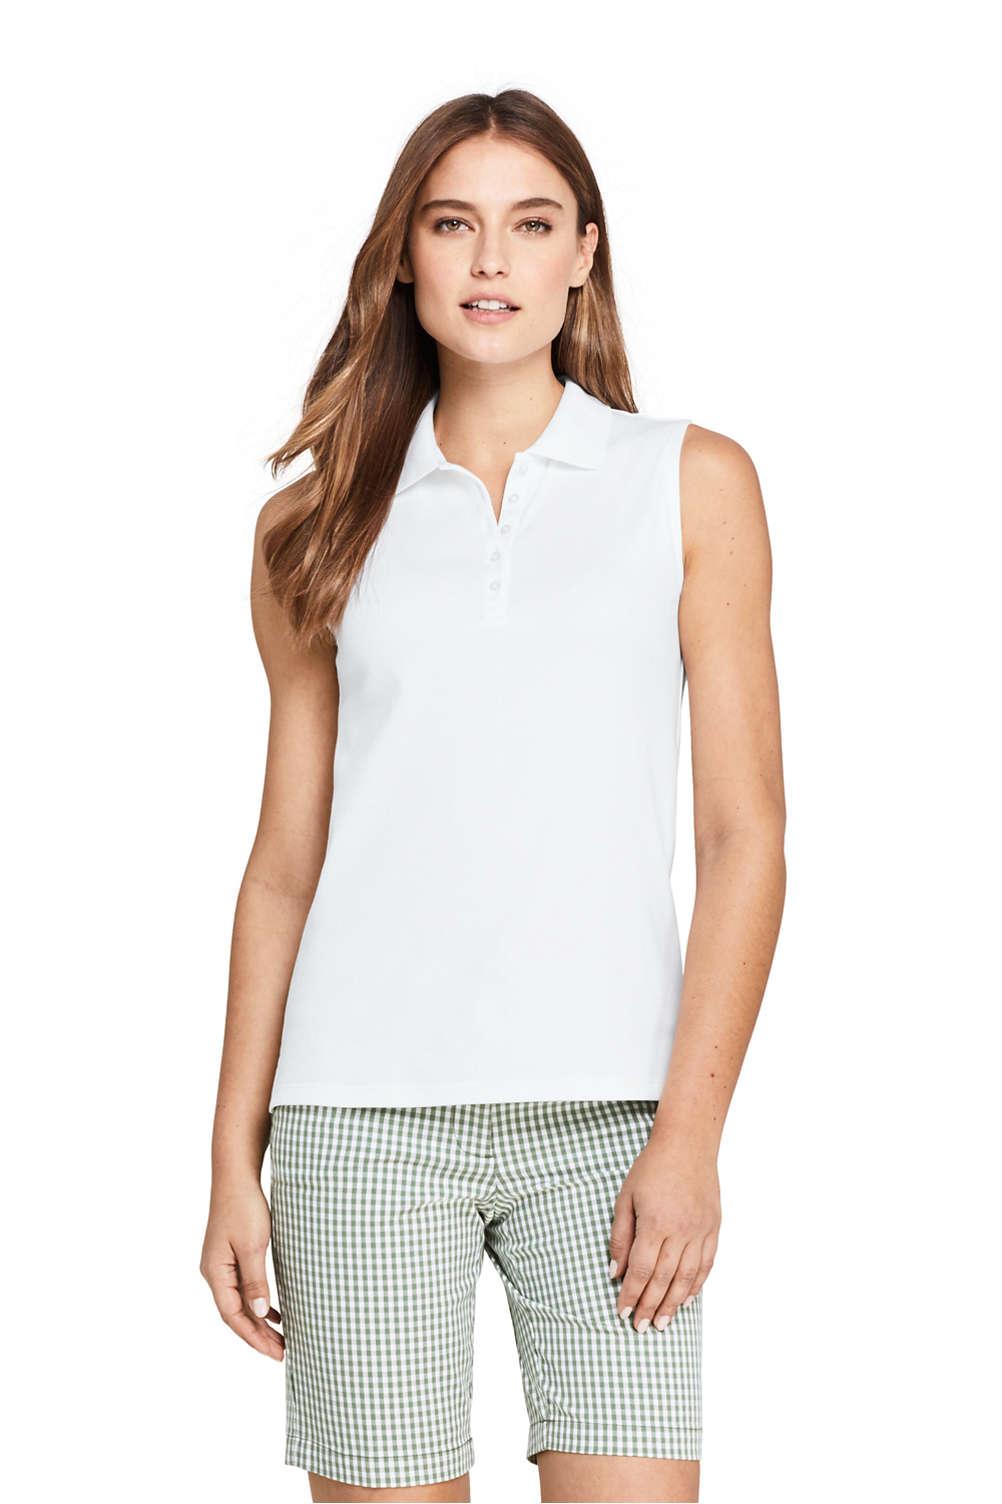 a9a9a8c072cb Women's Sleeveless Supima Cotton Polo Shirt from Lands' End